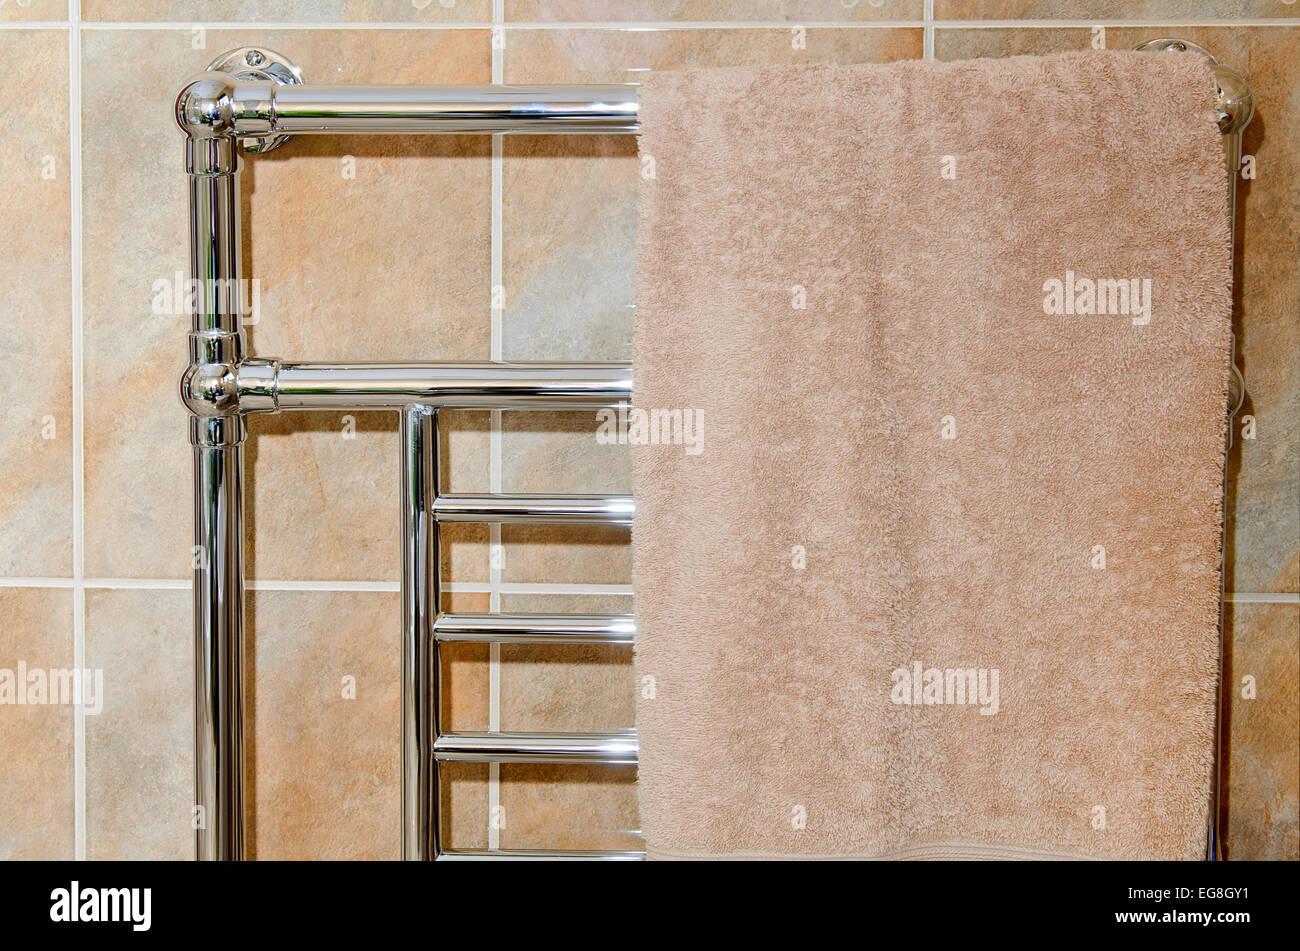 Chrome Bathroom Towel Radiators: Chrome Bathroom Towel Rail / Radiator Stock Photo, Royalty